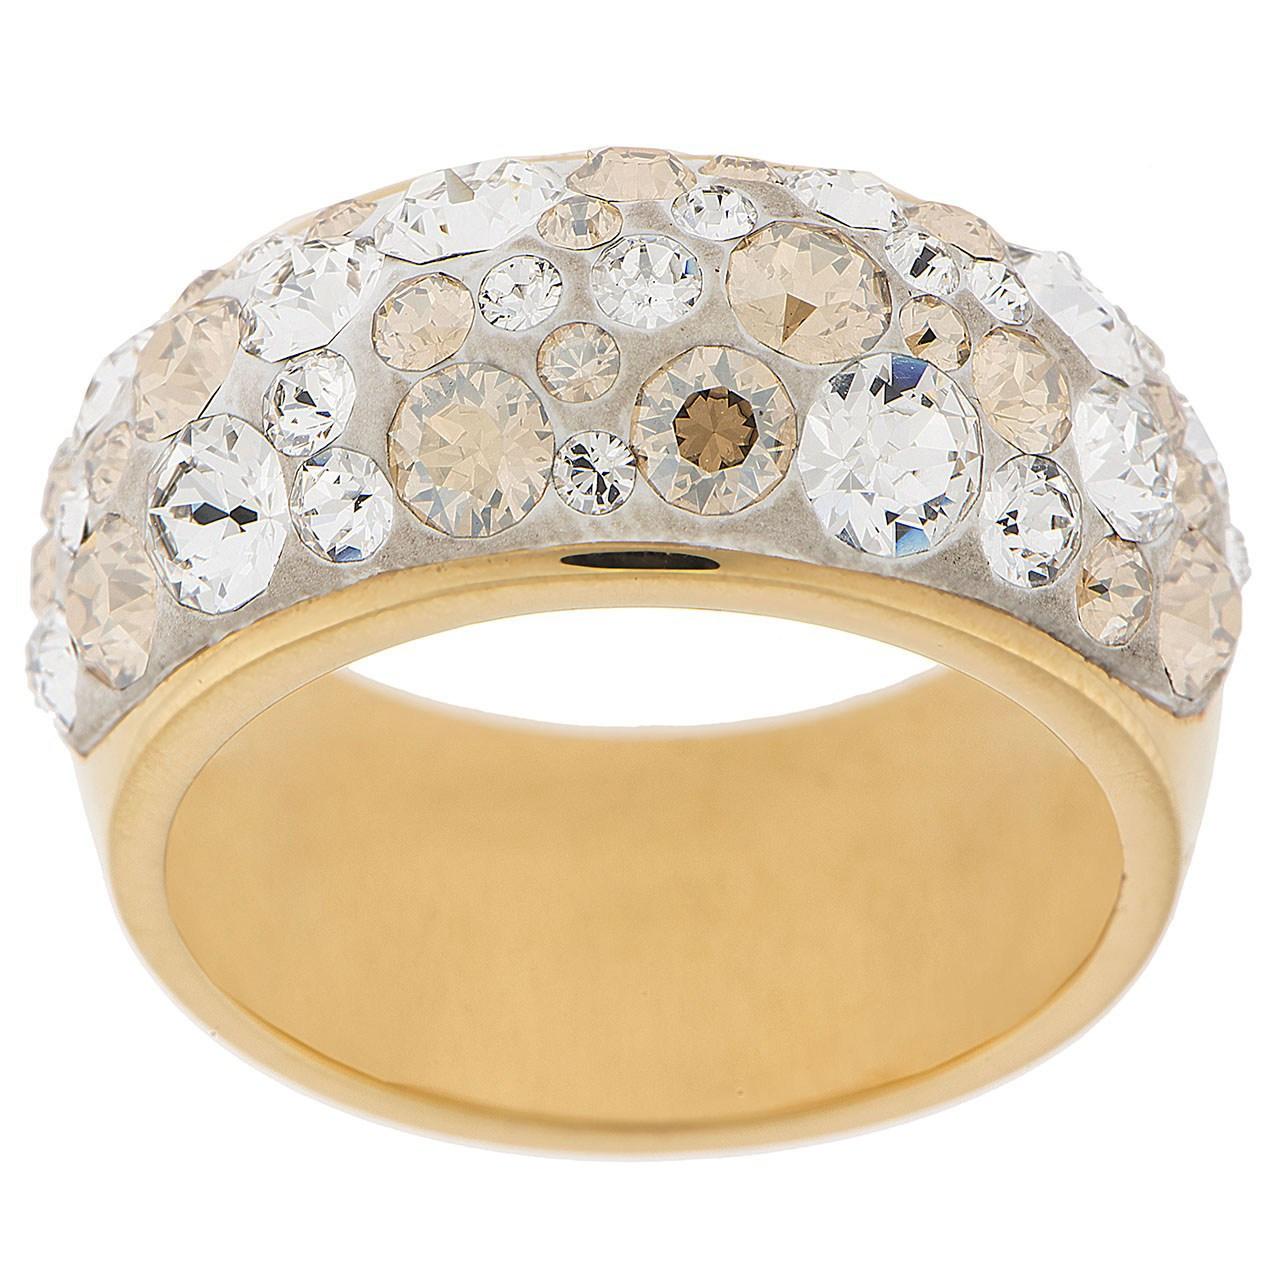 انگشتر الیور وبر مدل Chic Gold Crystal 41112GM